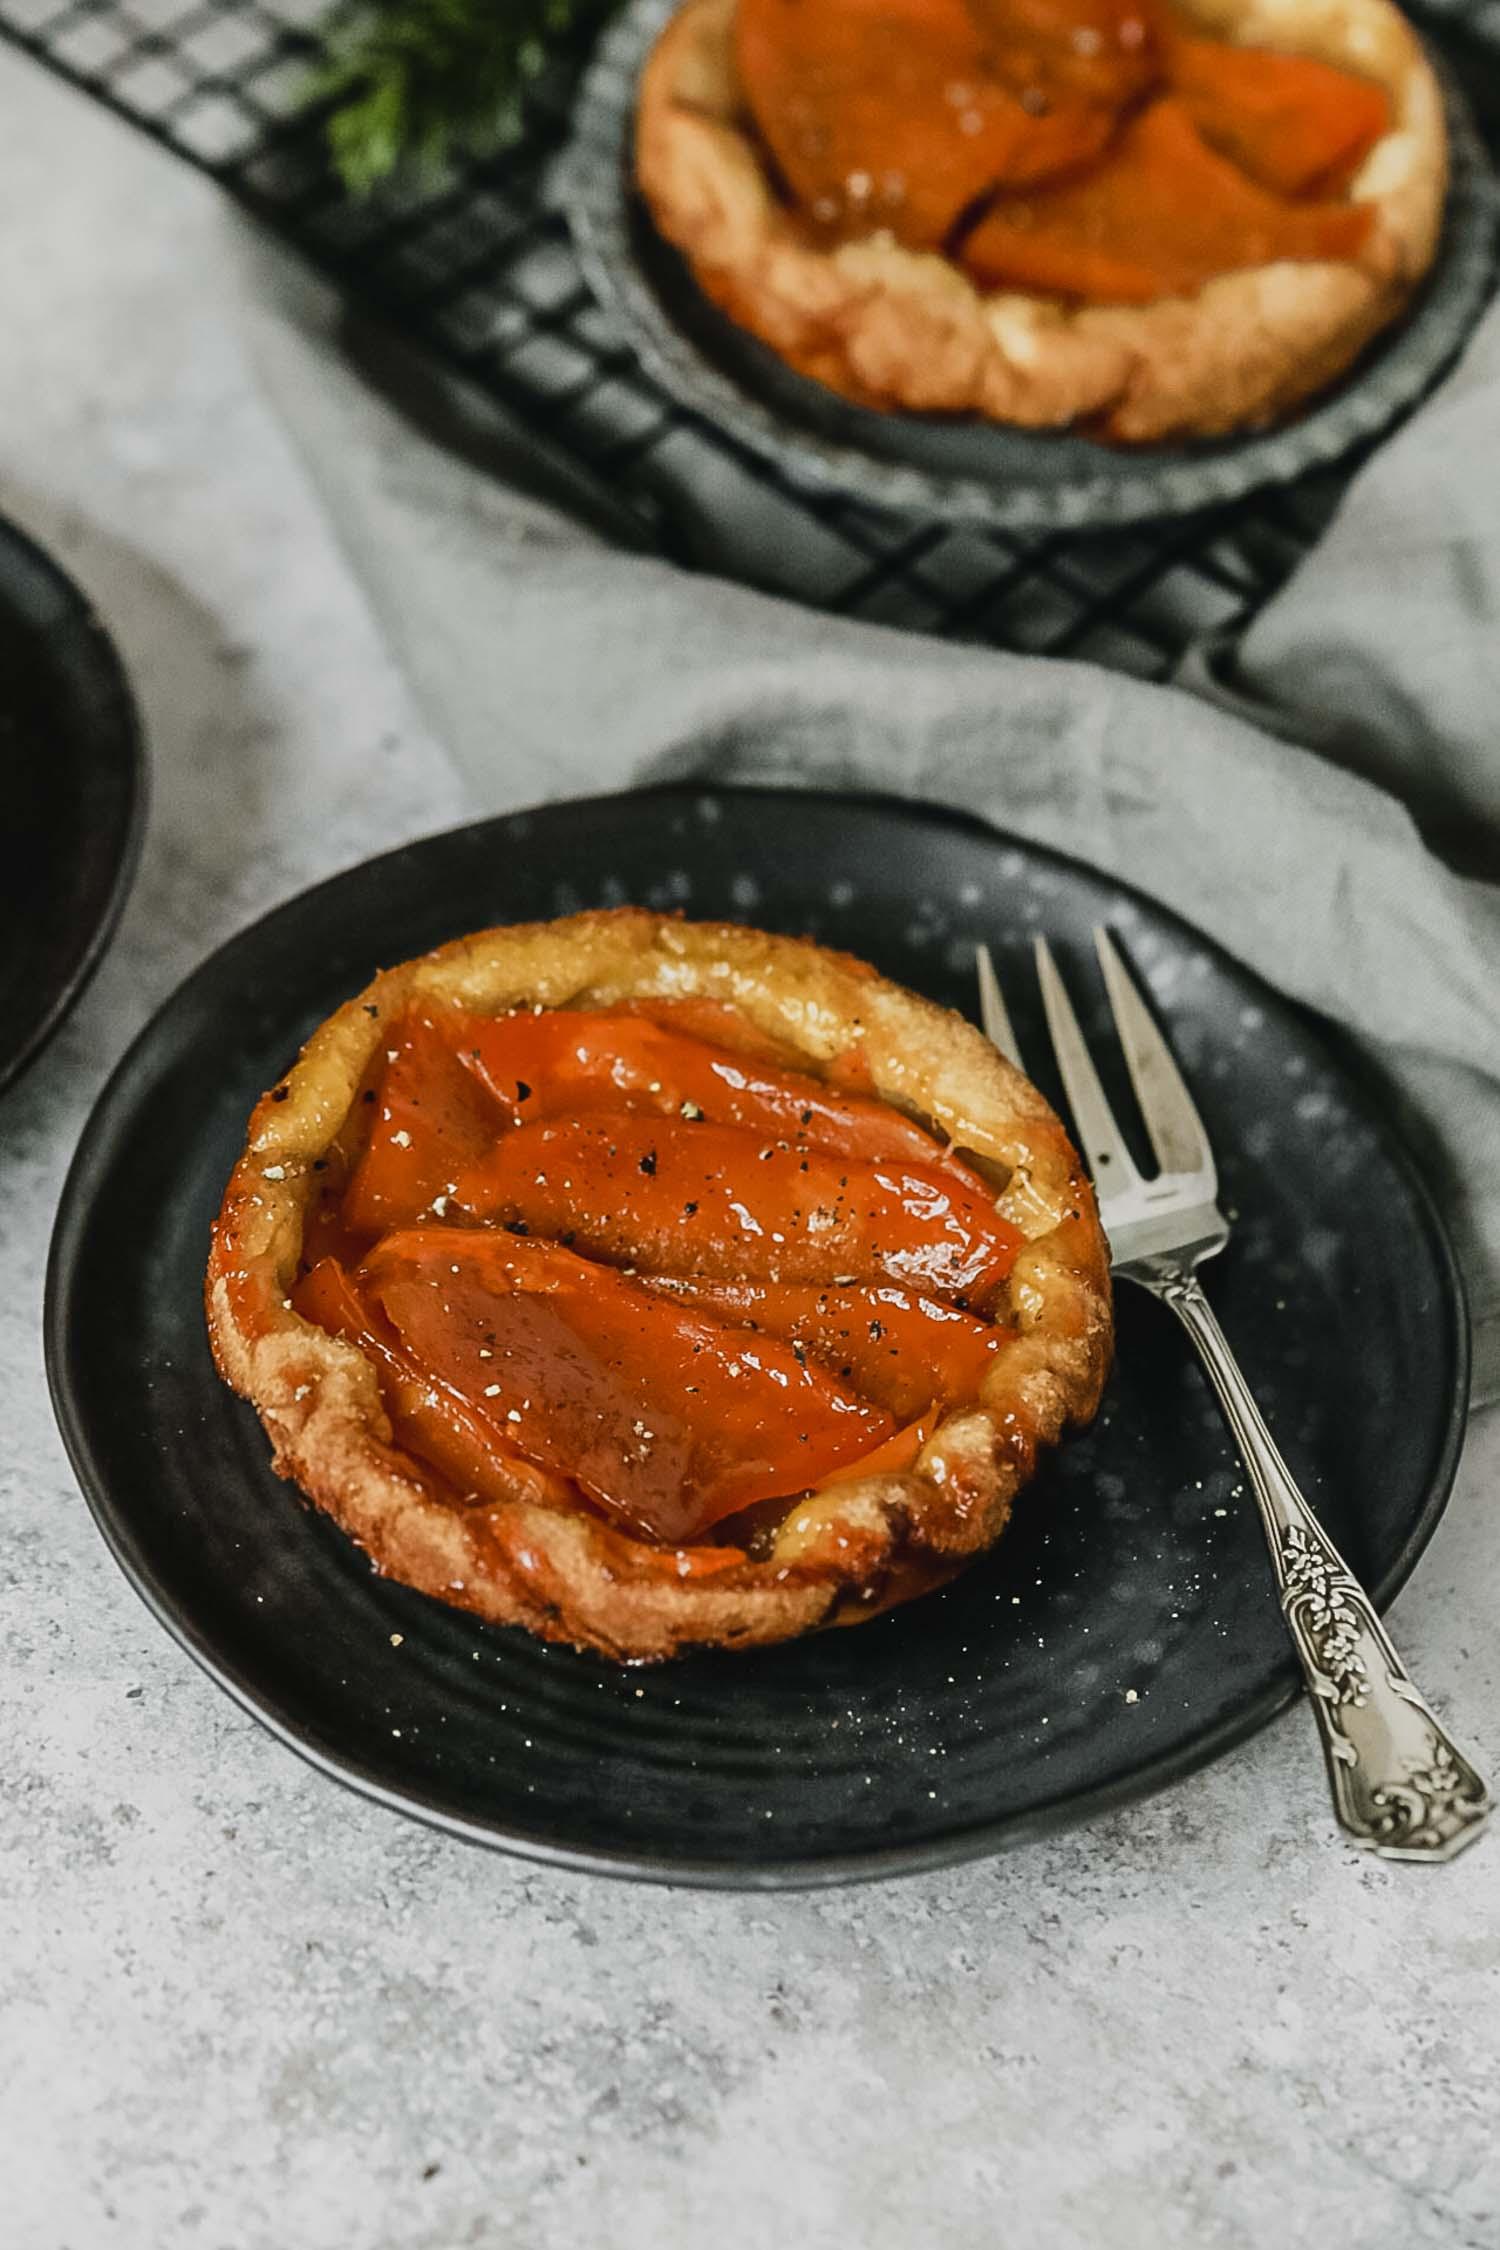 Recette vegan tarte tatin butternut au sirop d'érable